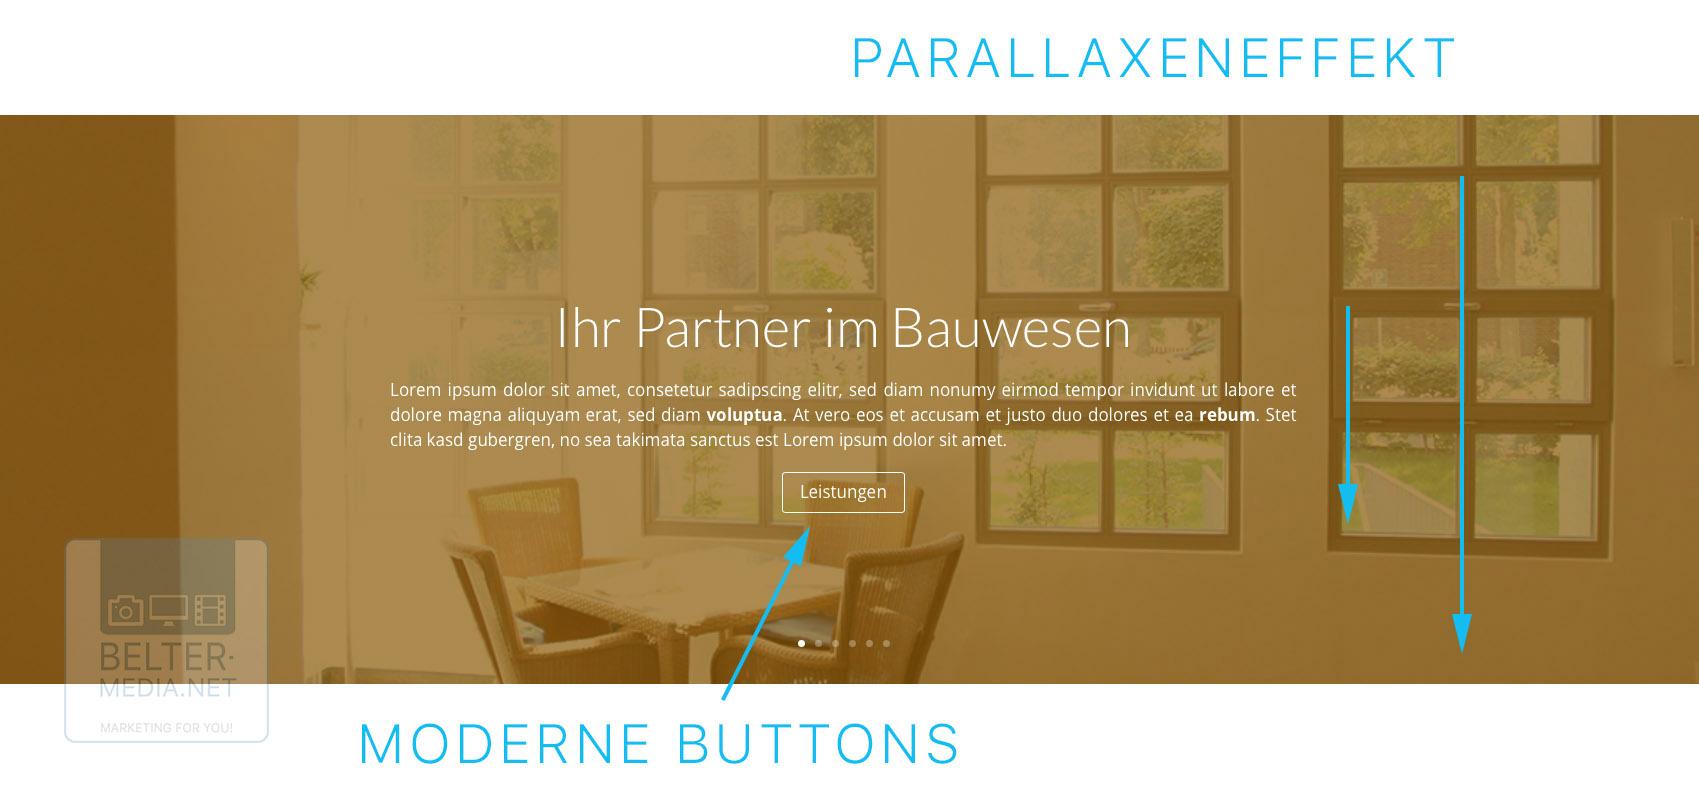 Moderne Effekte und Parallaxeneffekt (Belter-Media.Net)